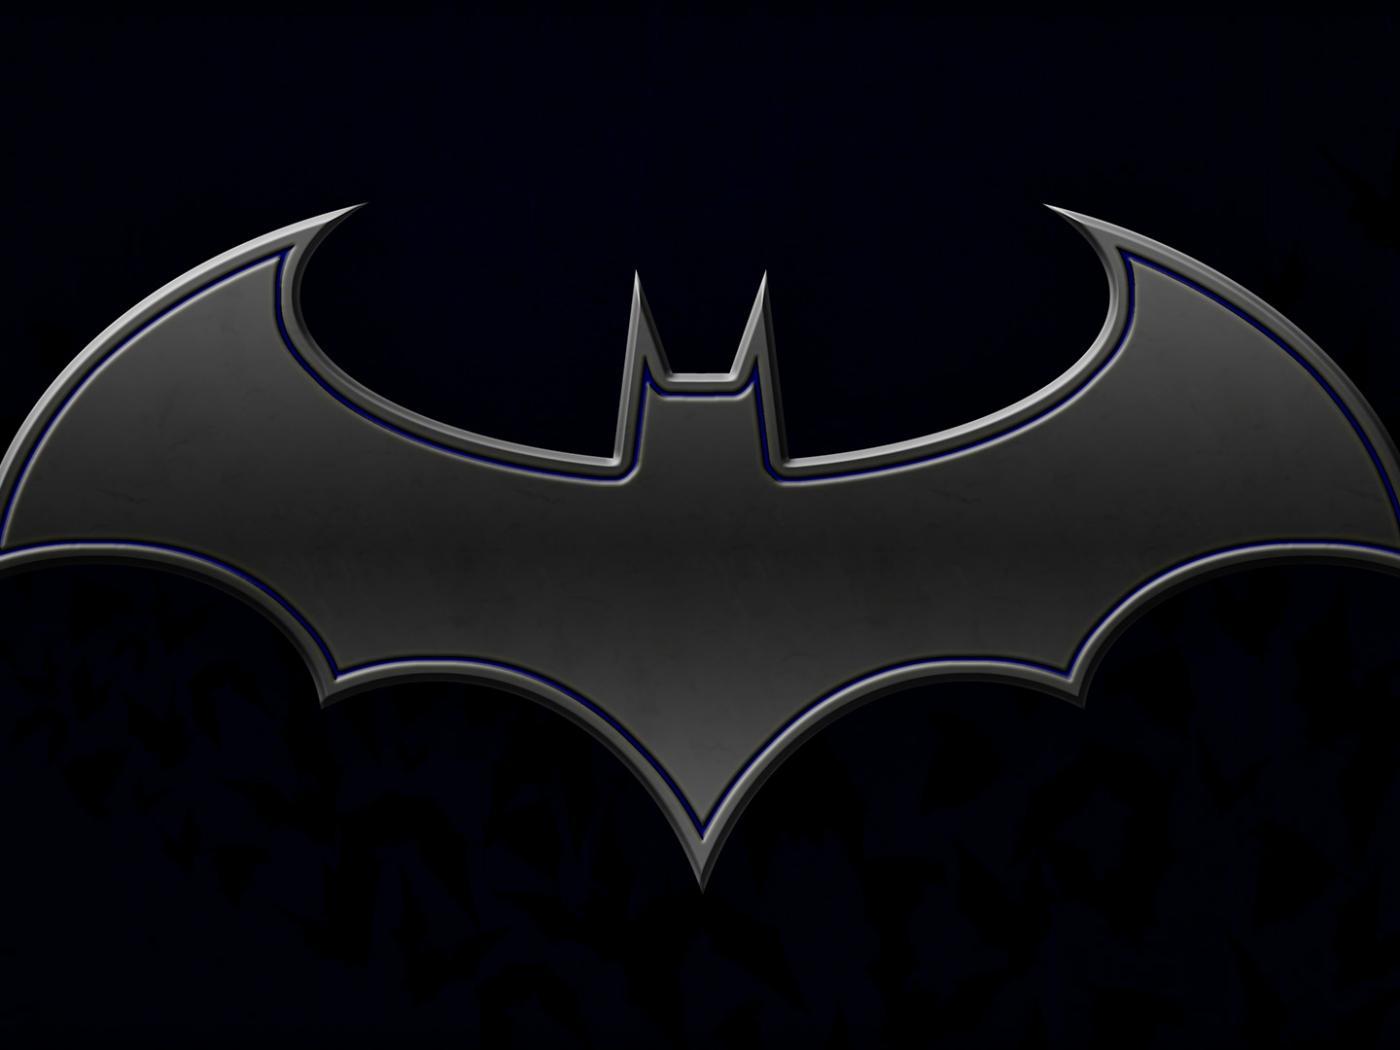 Batman Vs Superman Dawn Of Justice Logo Exclusive Hd 1400x1050